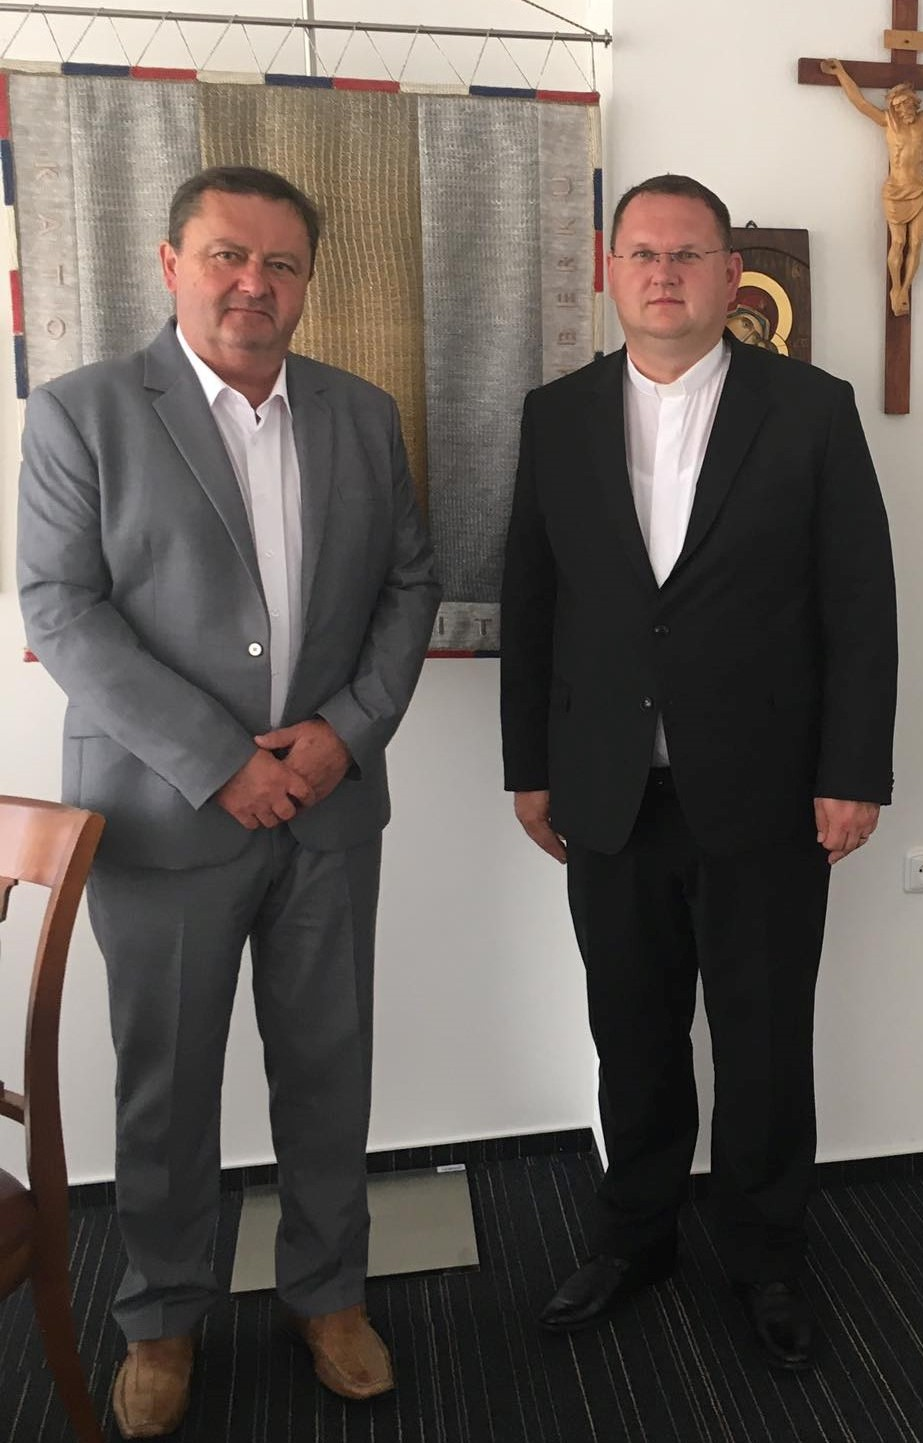 KU v Ružomberku navštívil rektor Pápežského slovenského kolégia sv. Cyrila a Metoda